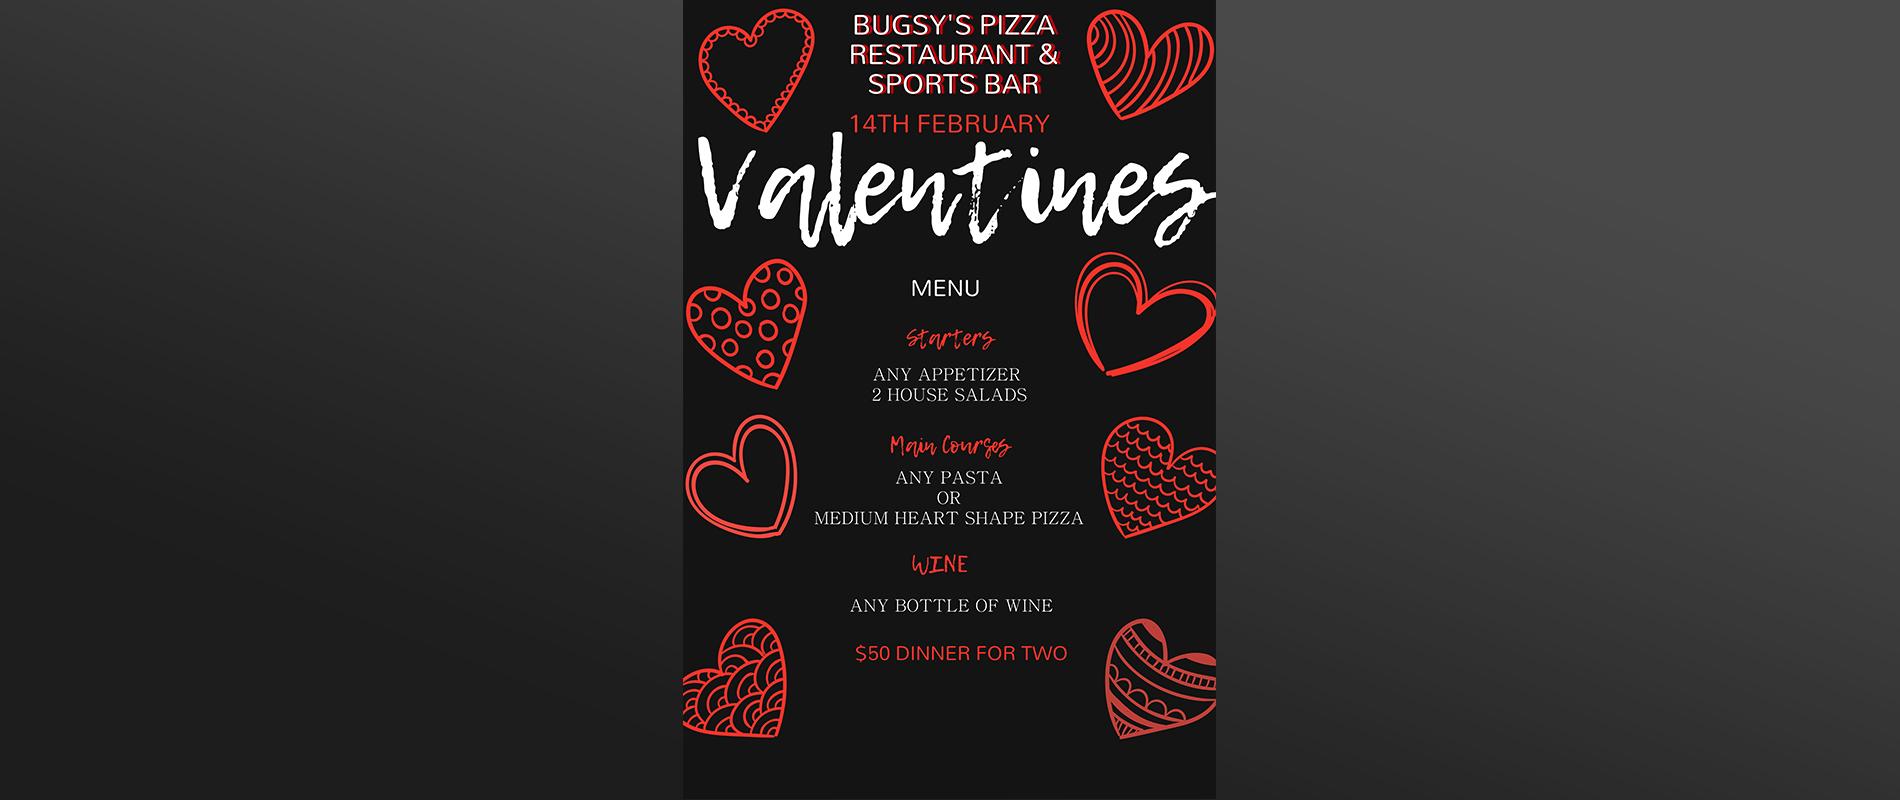 Bugsy's Pizza